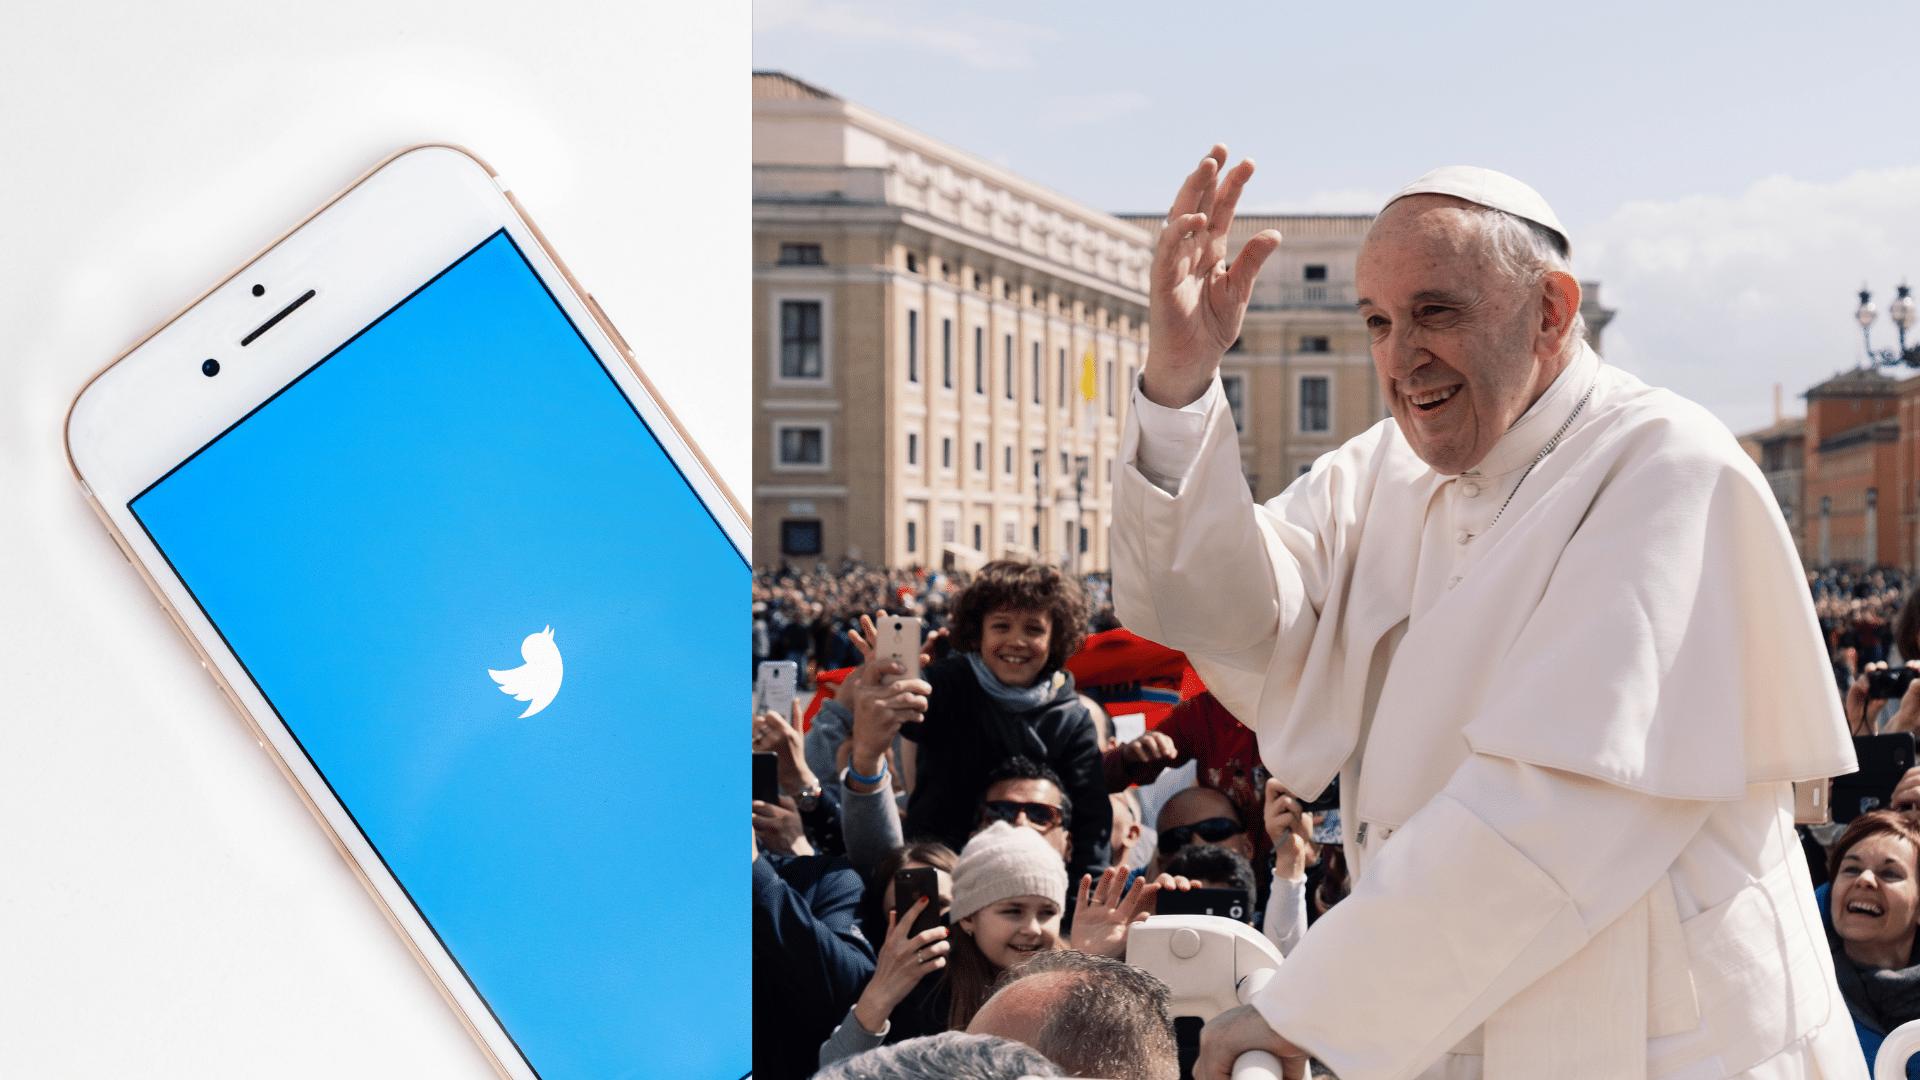 Pope Francis Meme